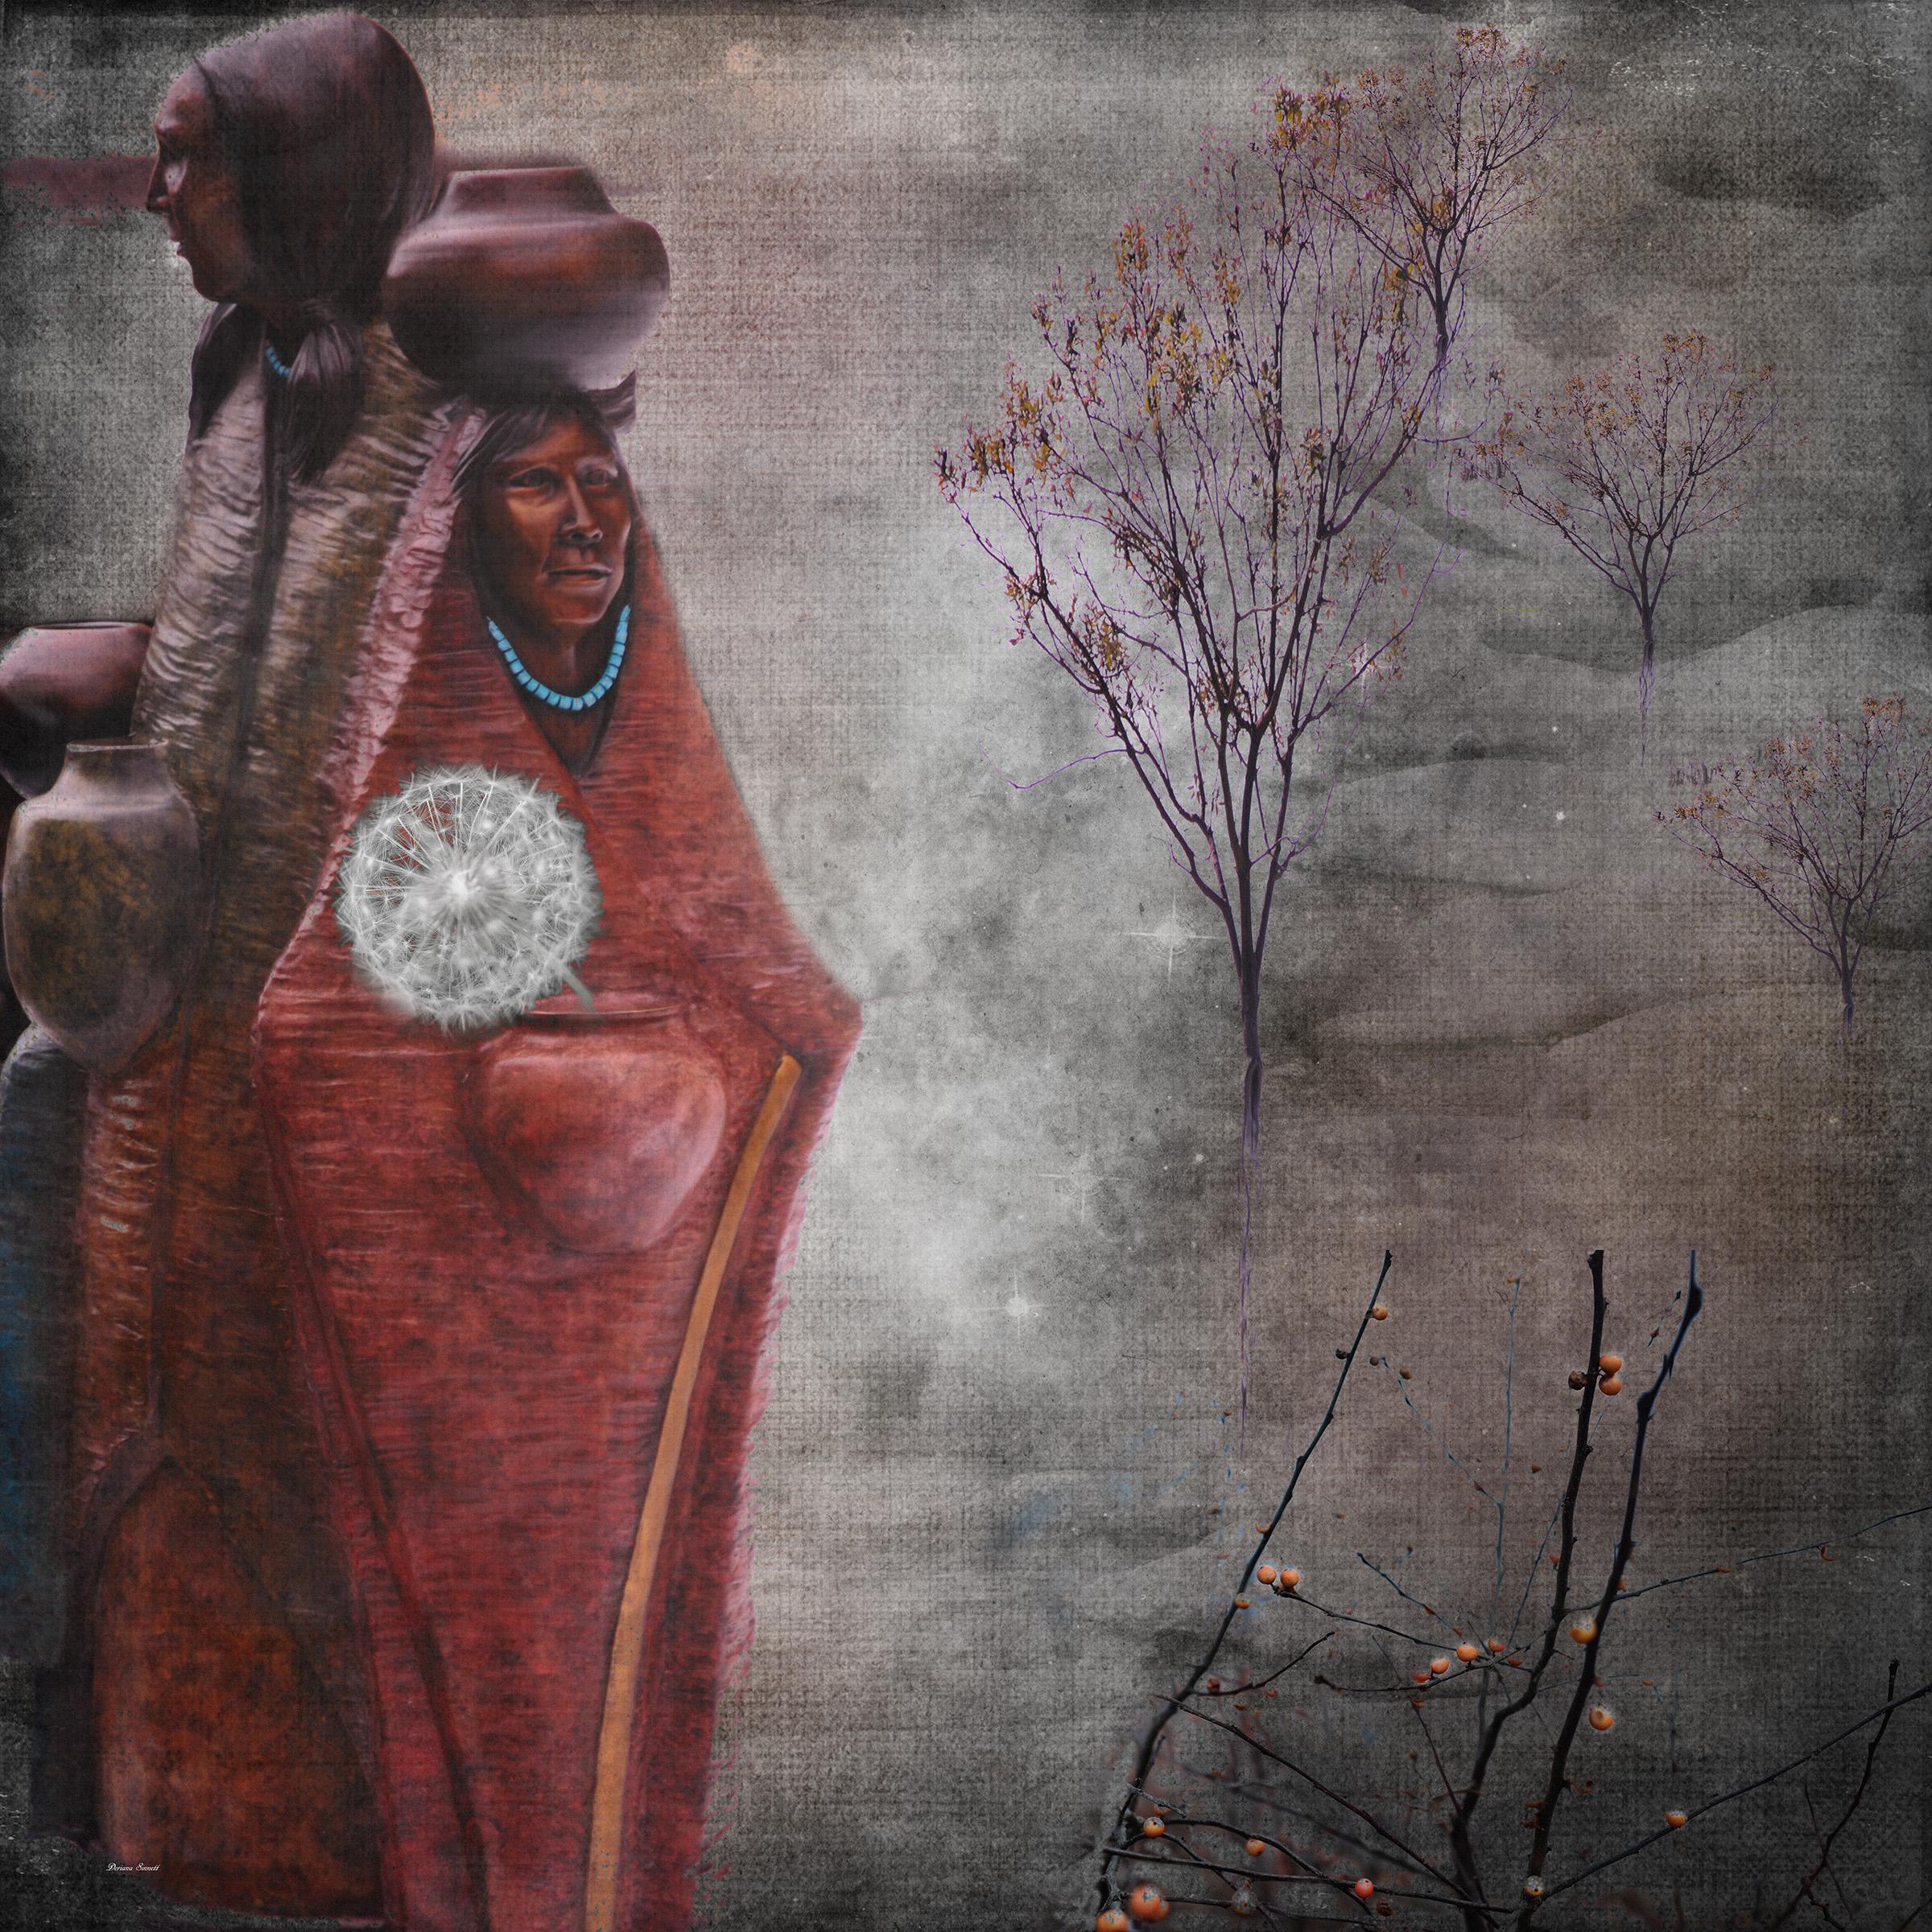 Beaver Creek Indian Sculptures…BUY  https://artboja.com/art/38vvy2/17240.php